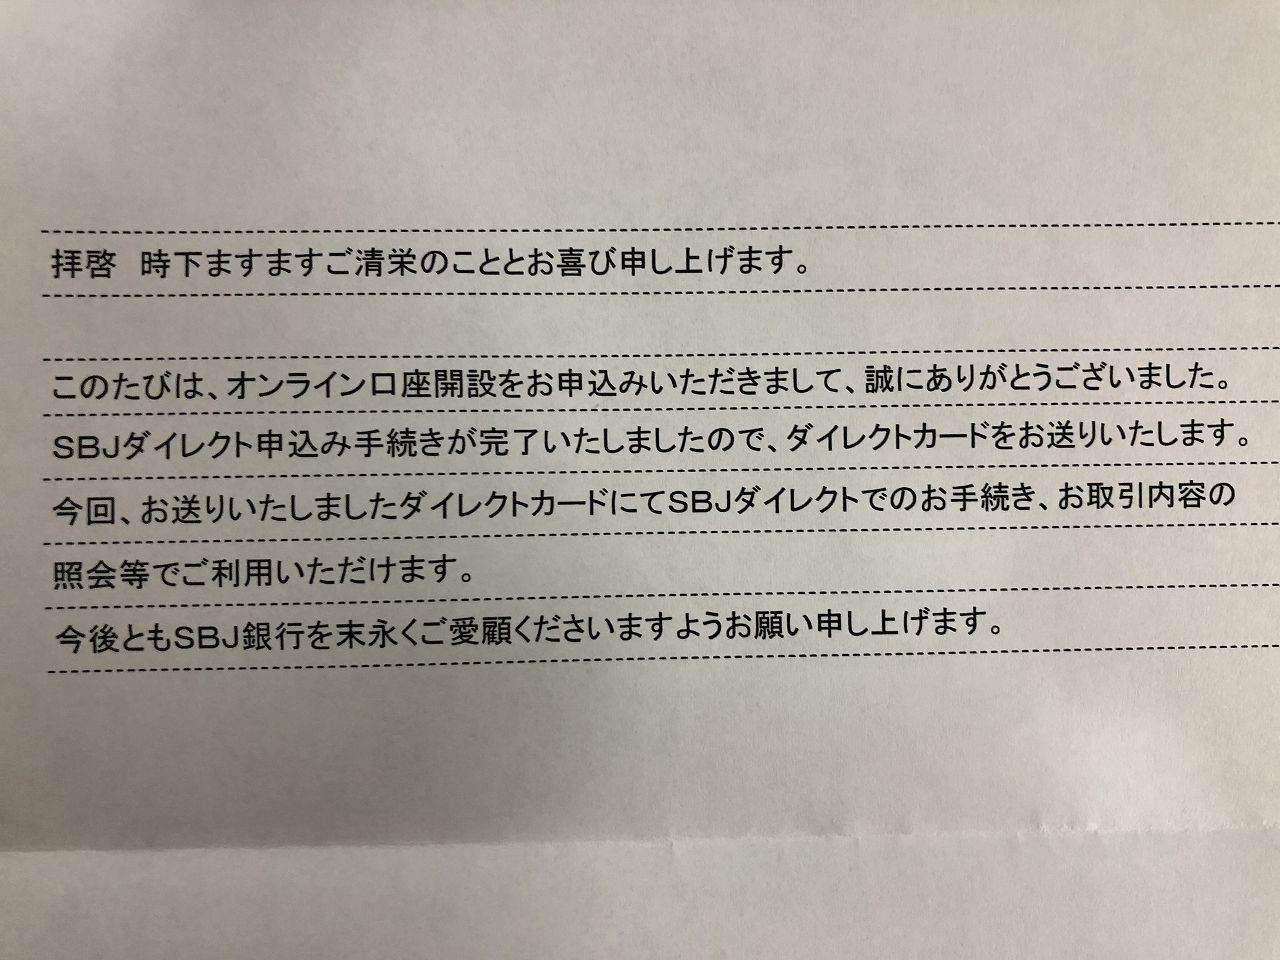 SBJ銀行手紙